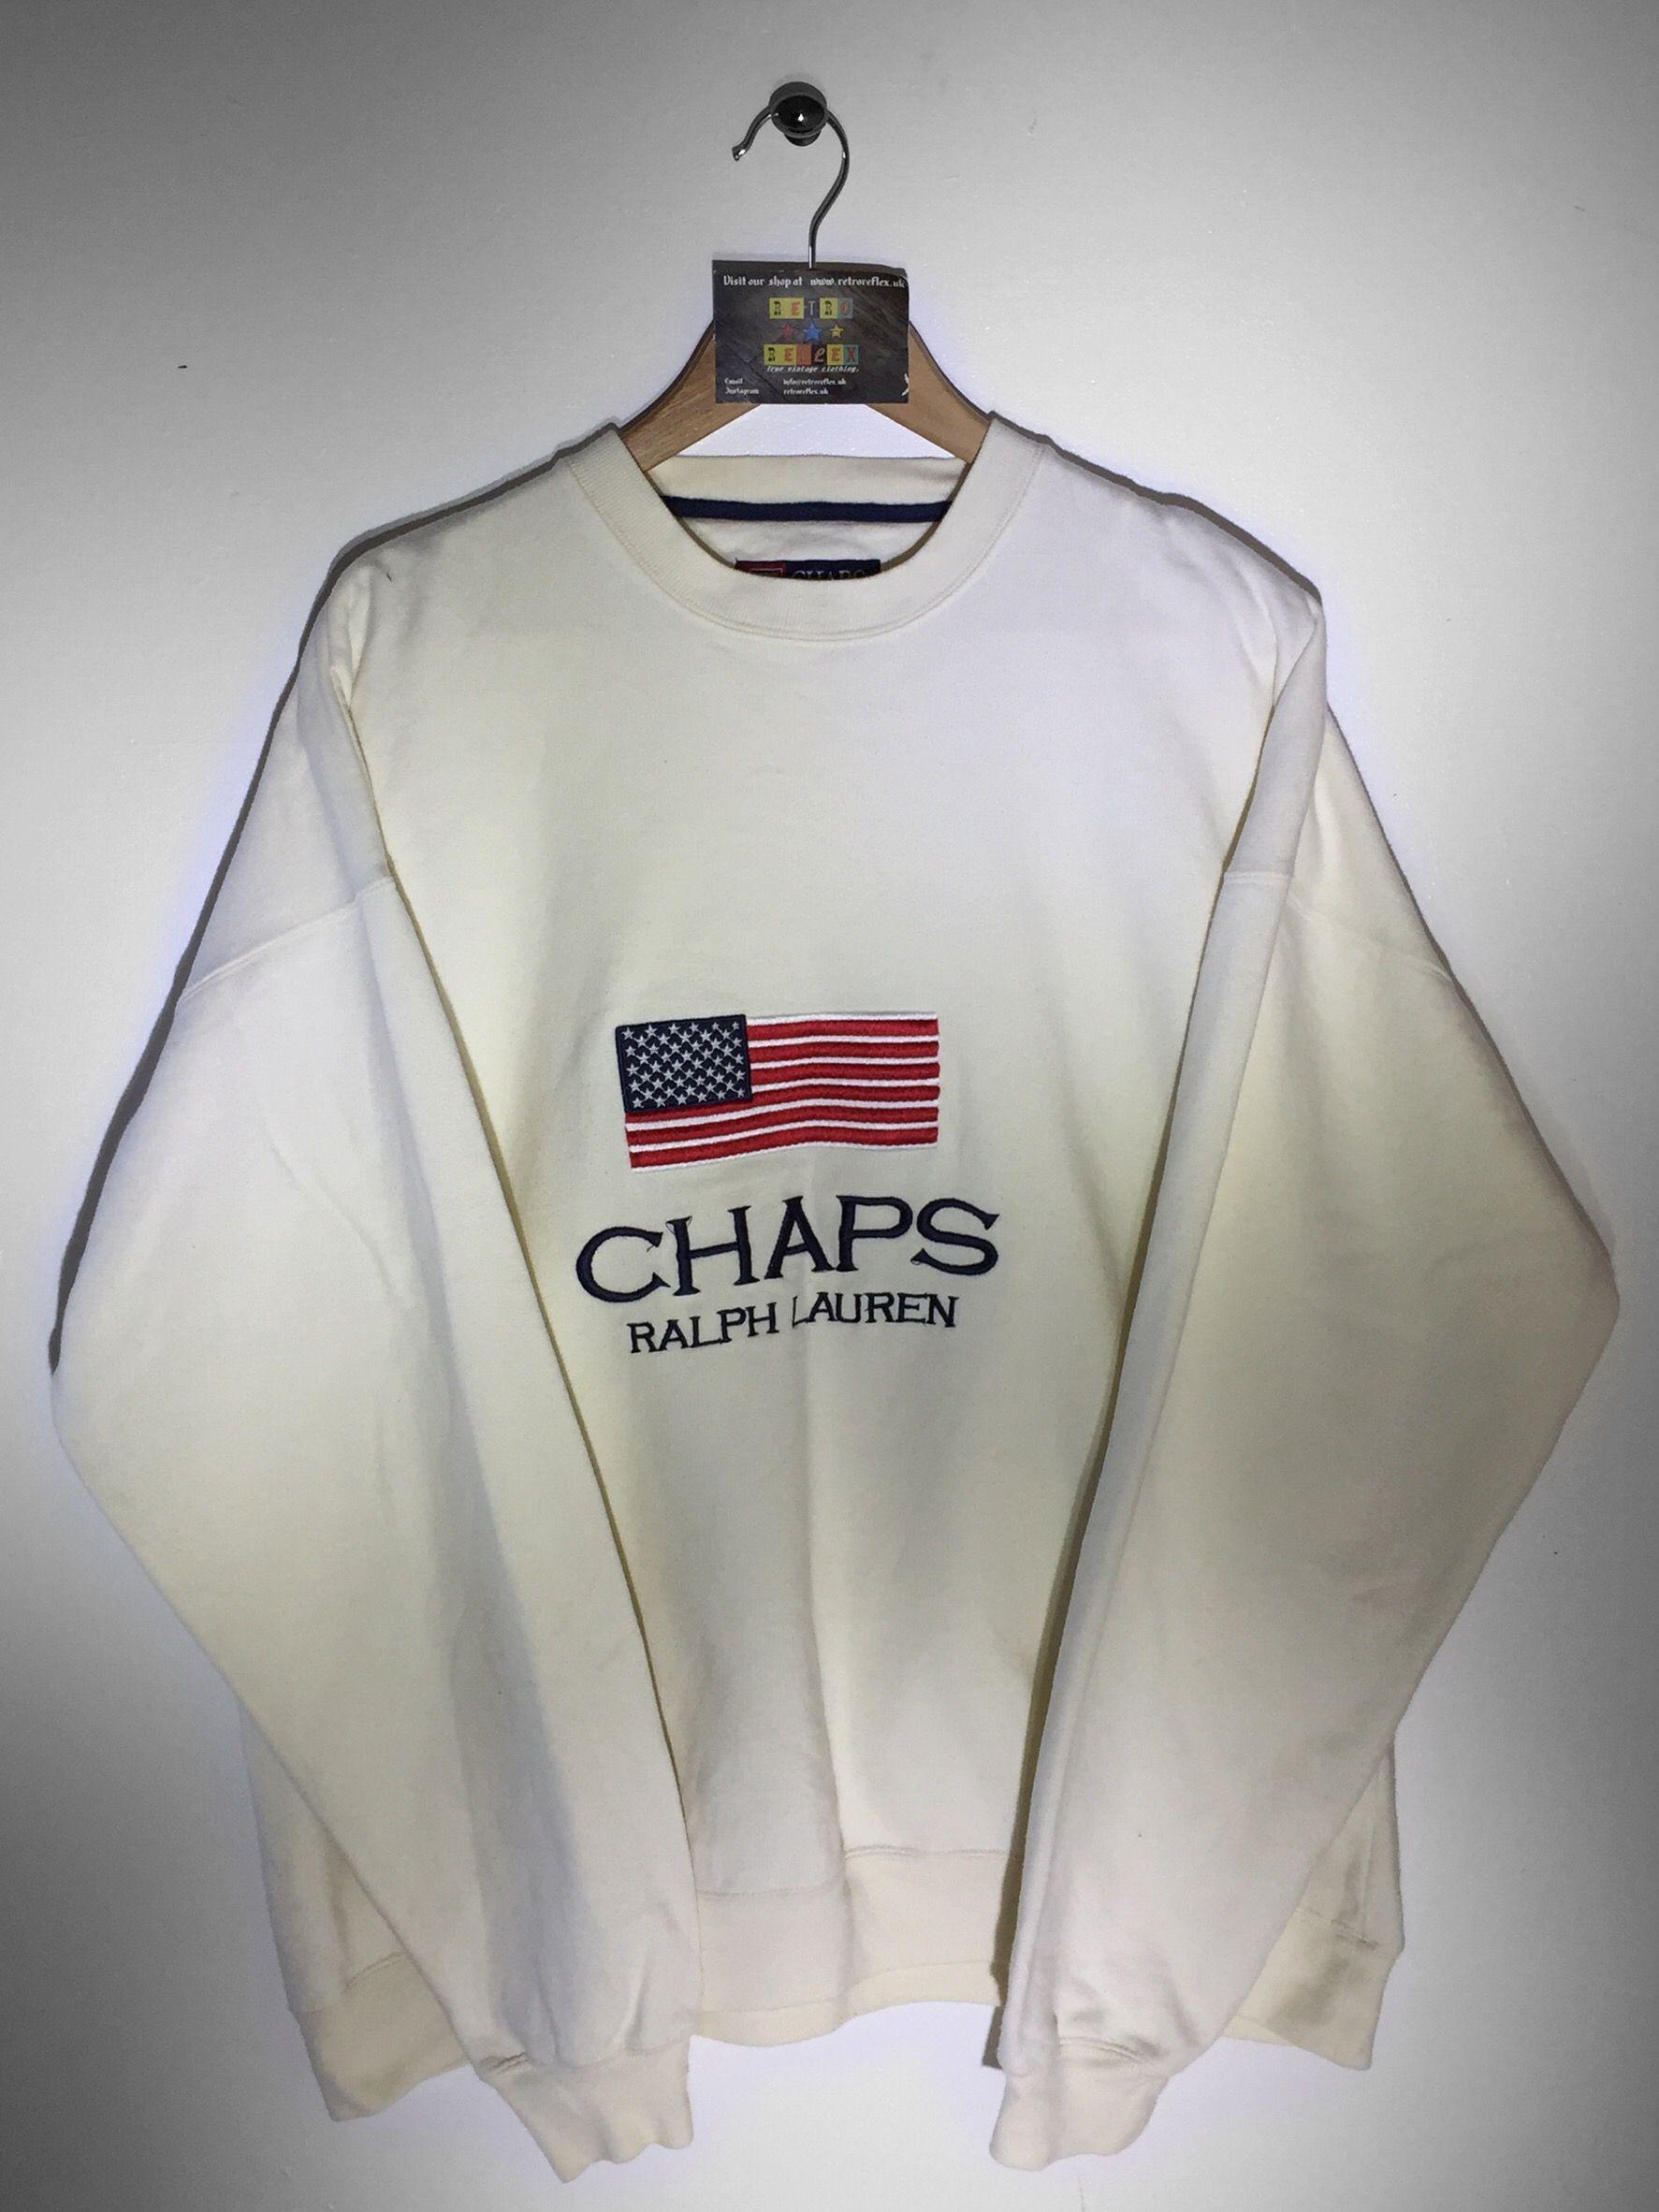 321a3705aab21 Ralph Lauren Chaps sweatshirt size X Large(but Fits Oversized) £60 Website➡  www.retroreflex.uk